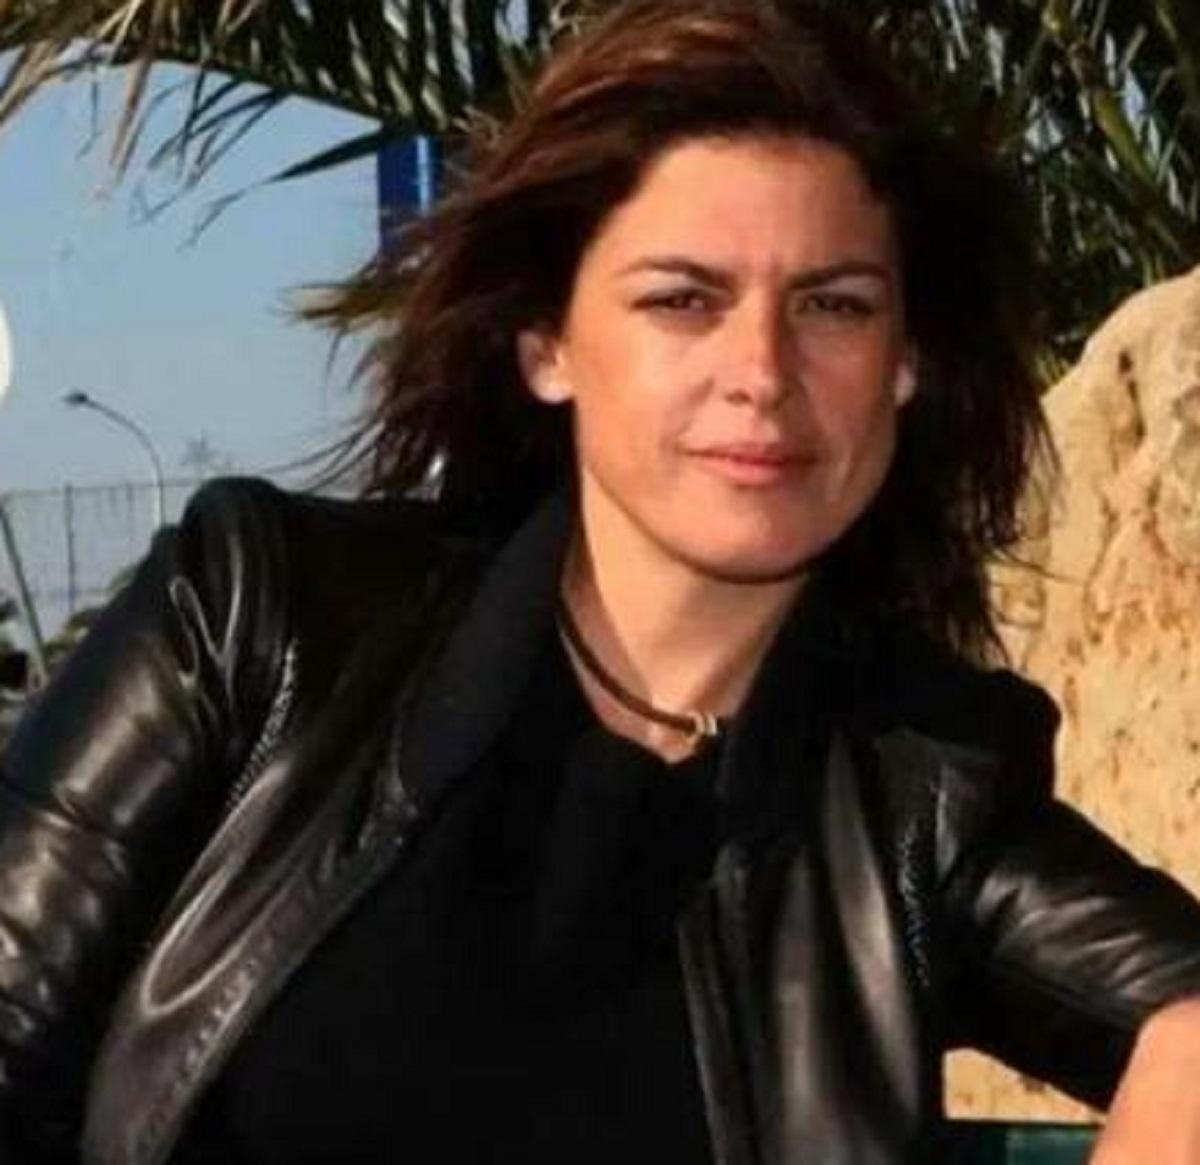 Lapo Elkann nozze Joana Lemos chi è